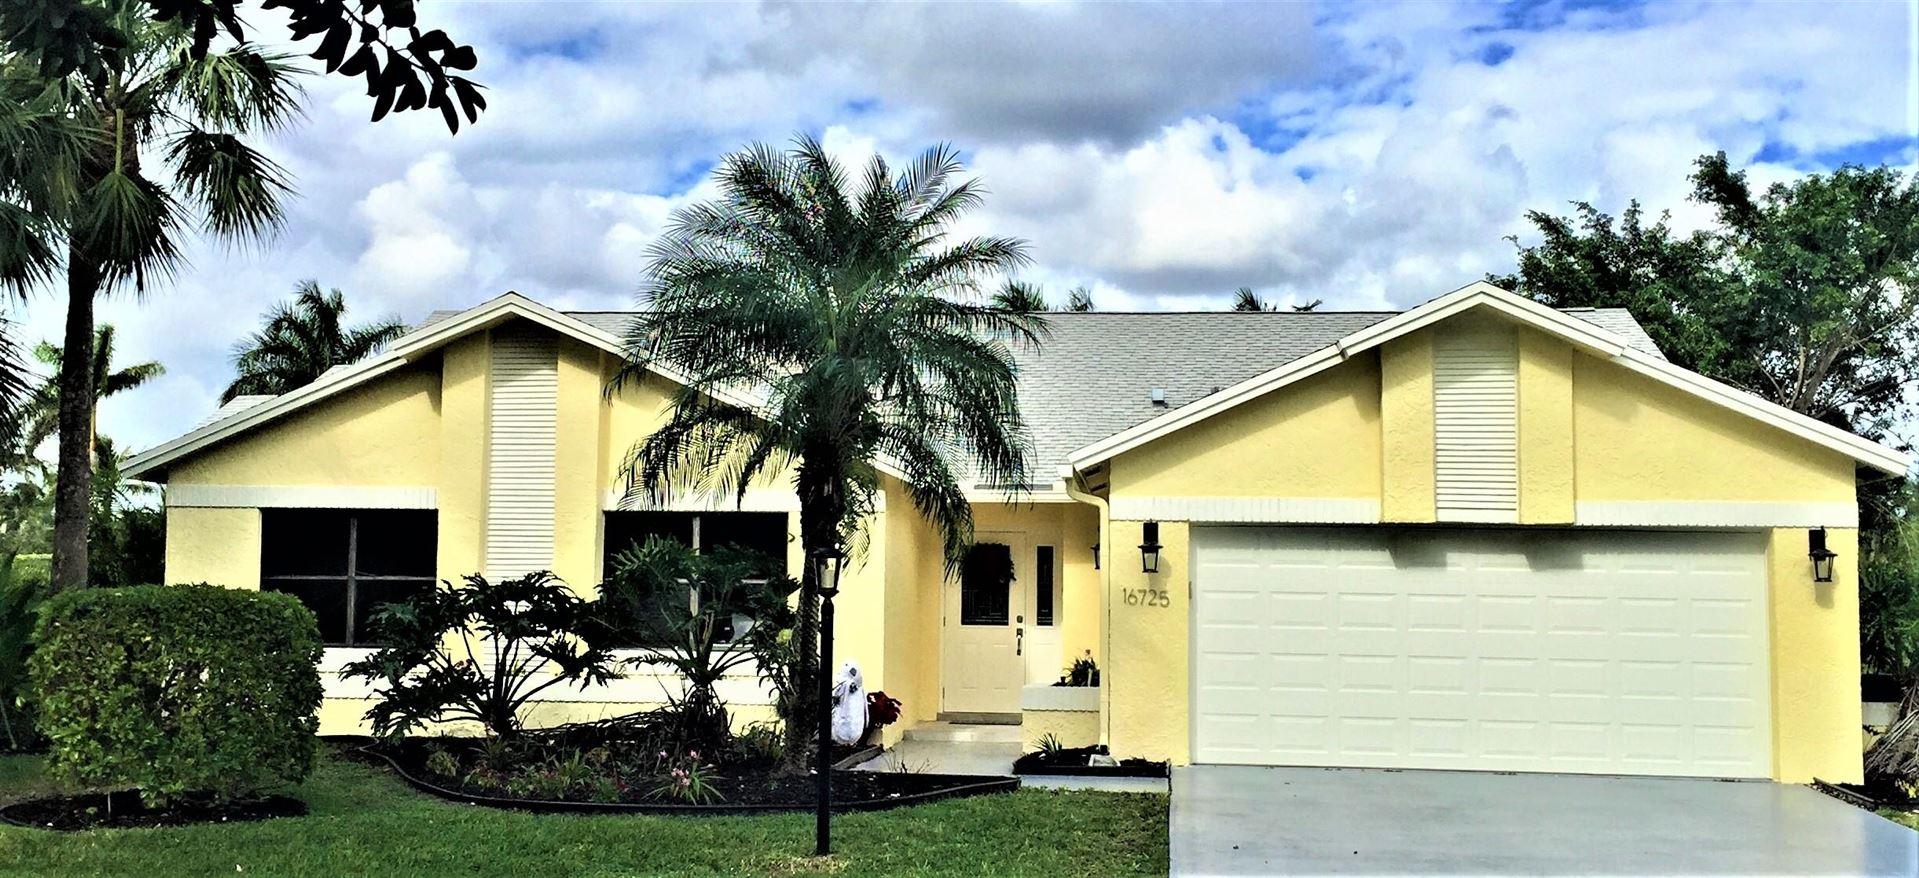 16725 Willow Creek Drive, Delray Beach, FL 33484 - #: RX-10664508